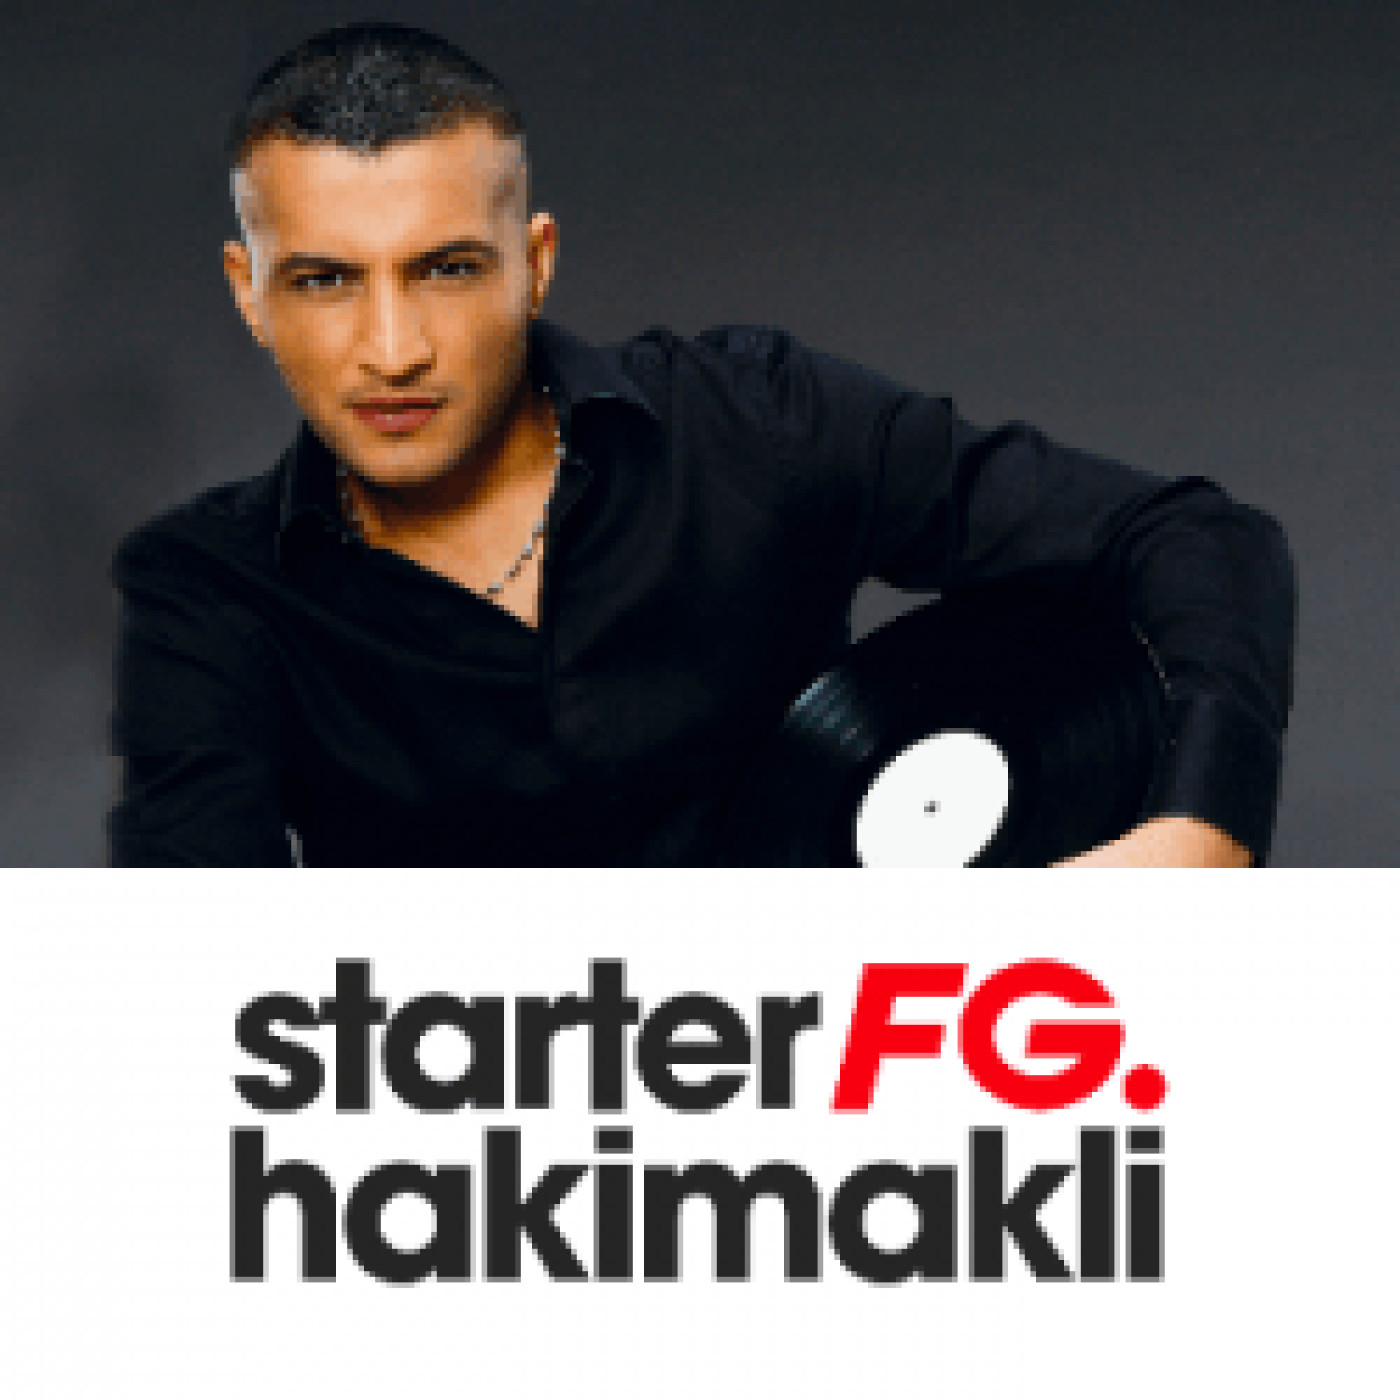 STARTER FG BY HAKIMAKLI LUNDI 7 DECEMBRE 2020